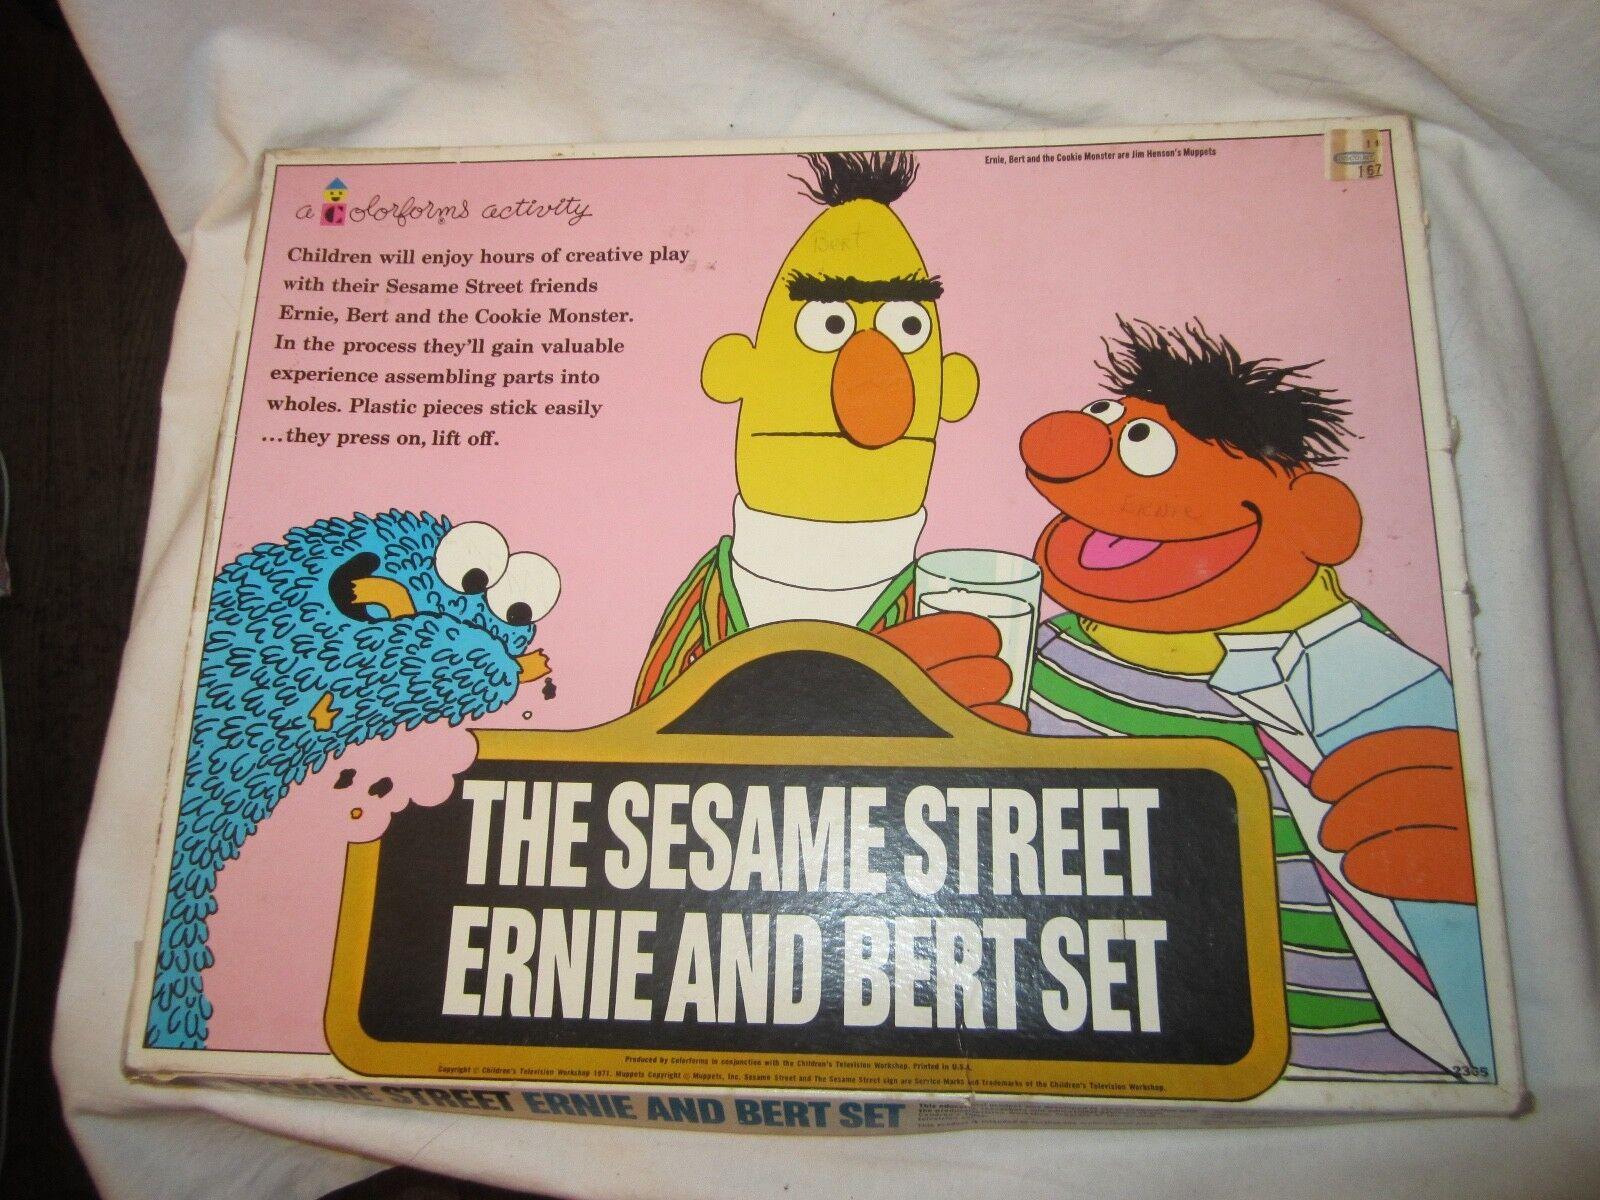 Vintage 1971 Muppets Sesame Street Ernie & Bert Set colorforms Activity